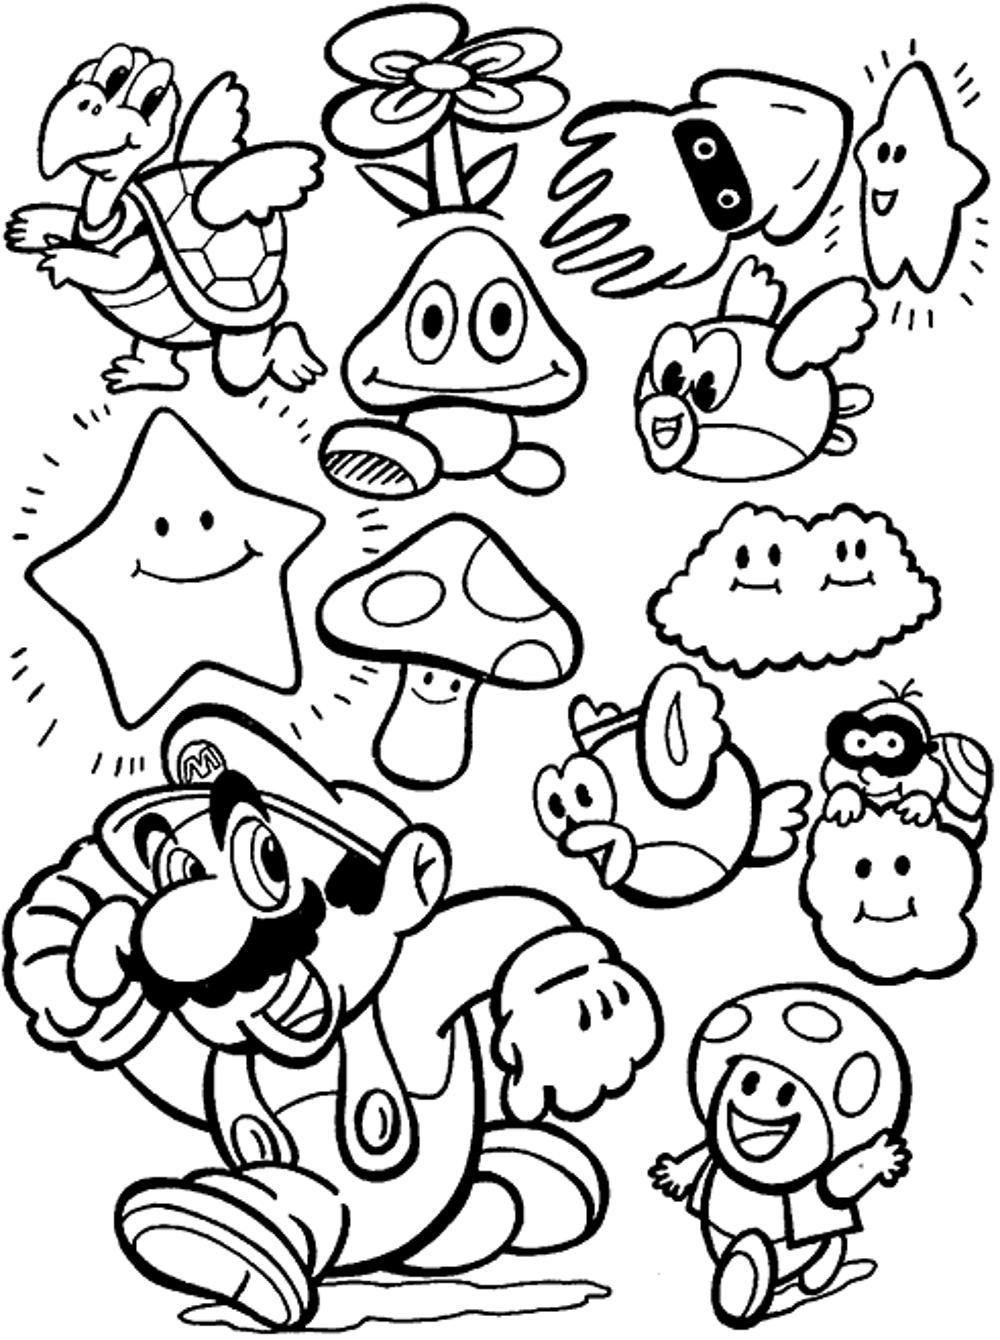 Super Mario Coloring Pictures